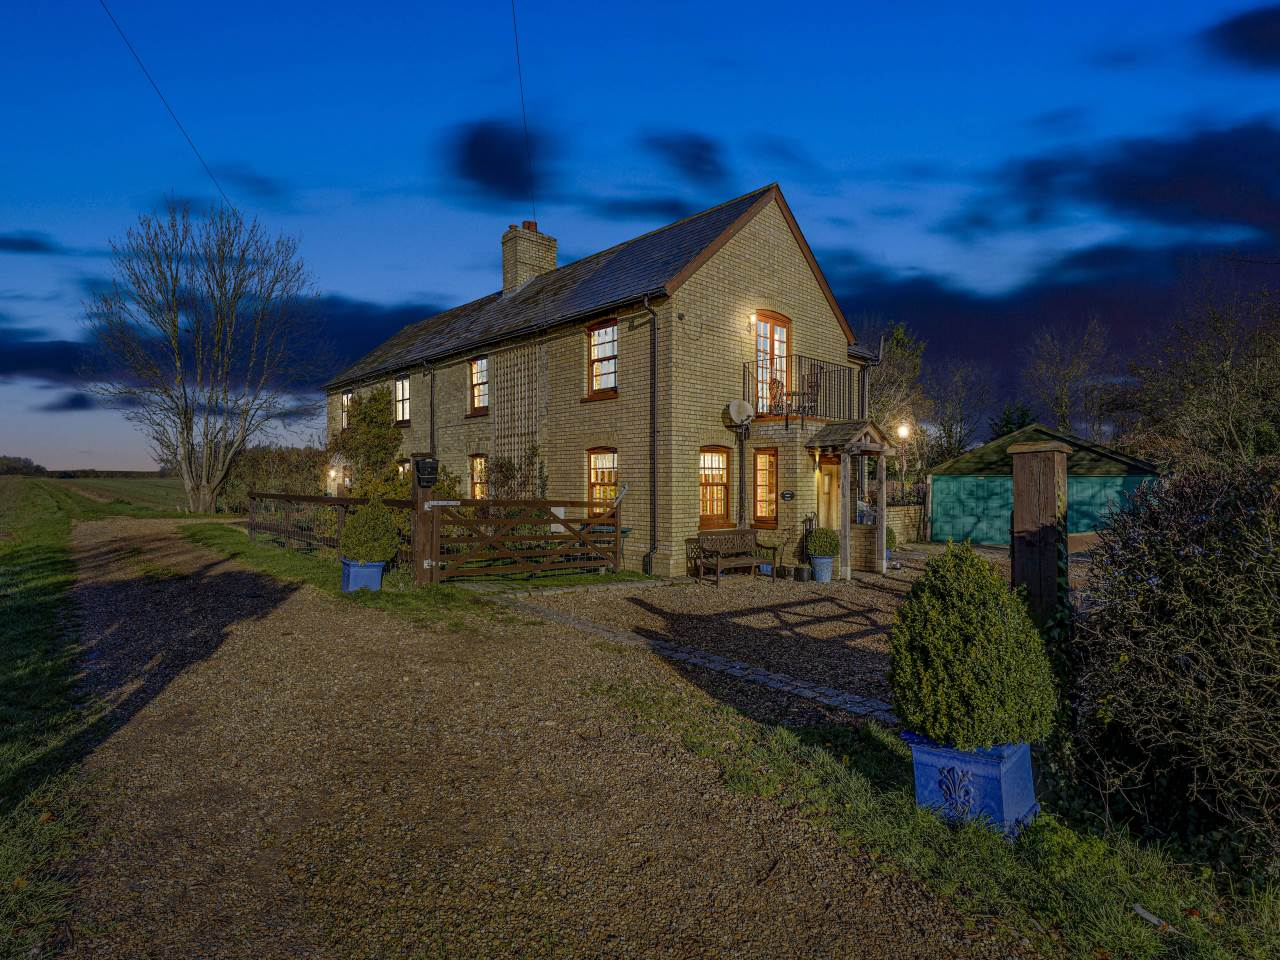 3 bed house for sale in Little Green, Guilden Morden 0